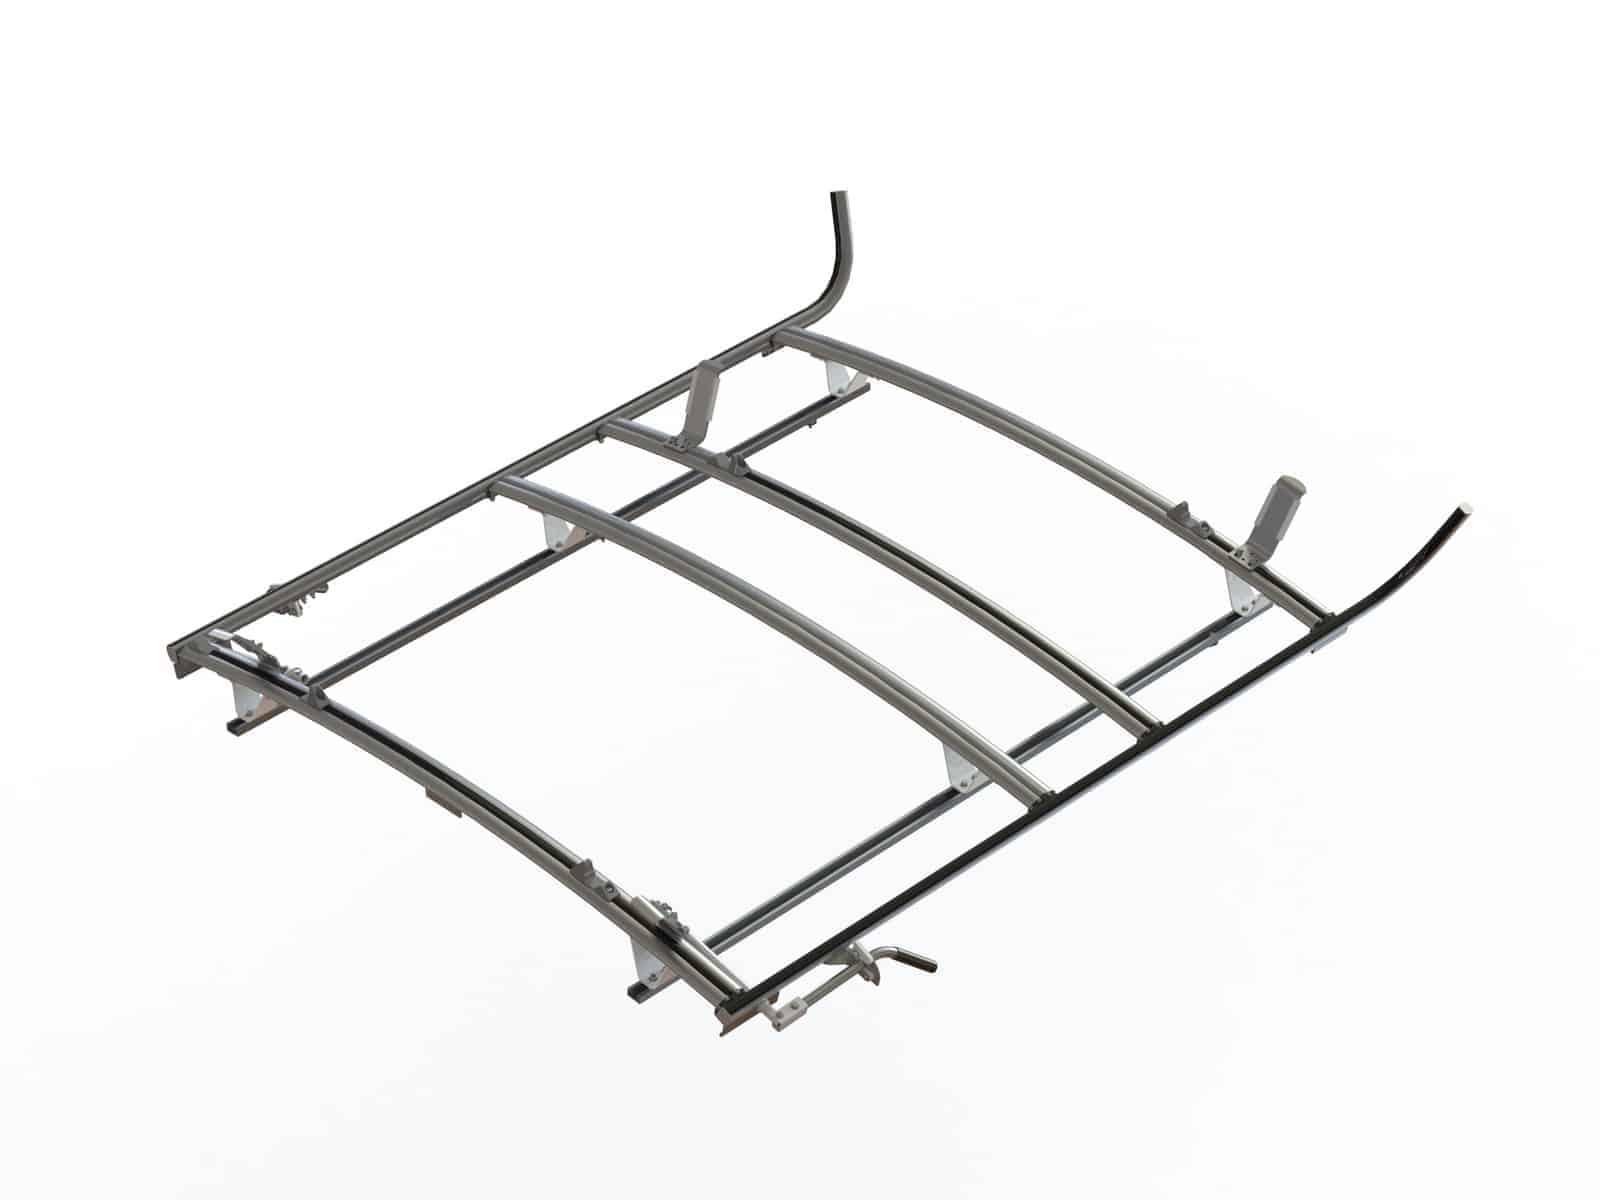 Heavy Duty Aluminum Van Ladder Racks